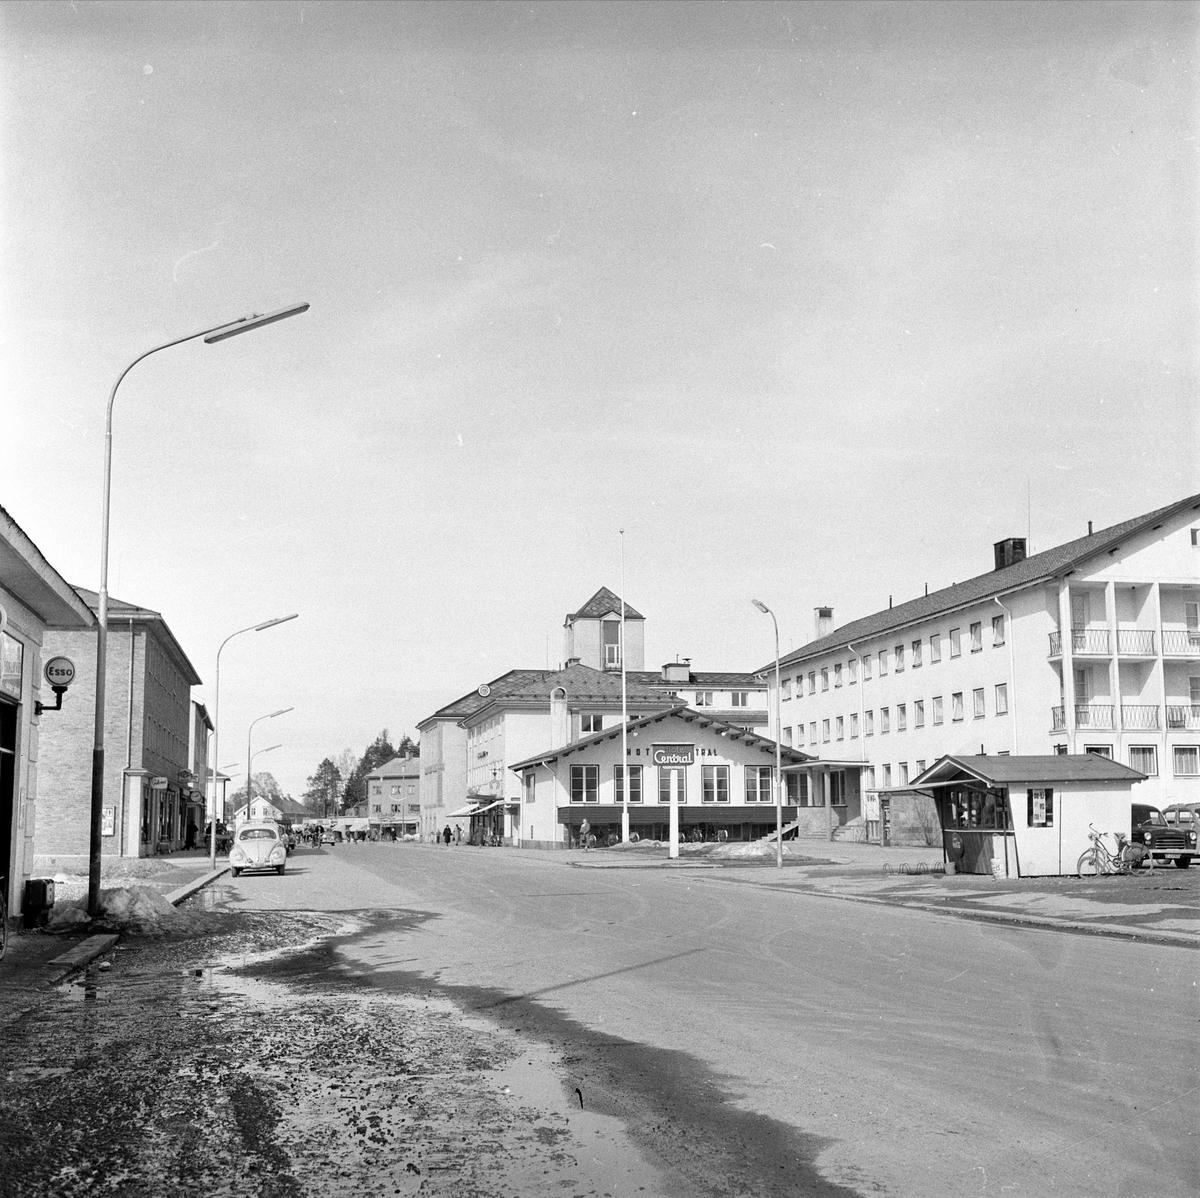 Elverum, 05.04.1960. 20 år etter 9.april 1940. Bygate med Hotel Central.